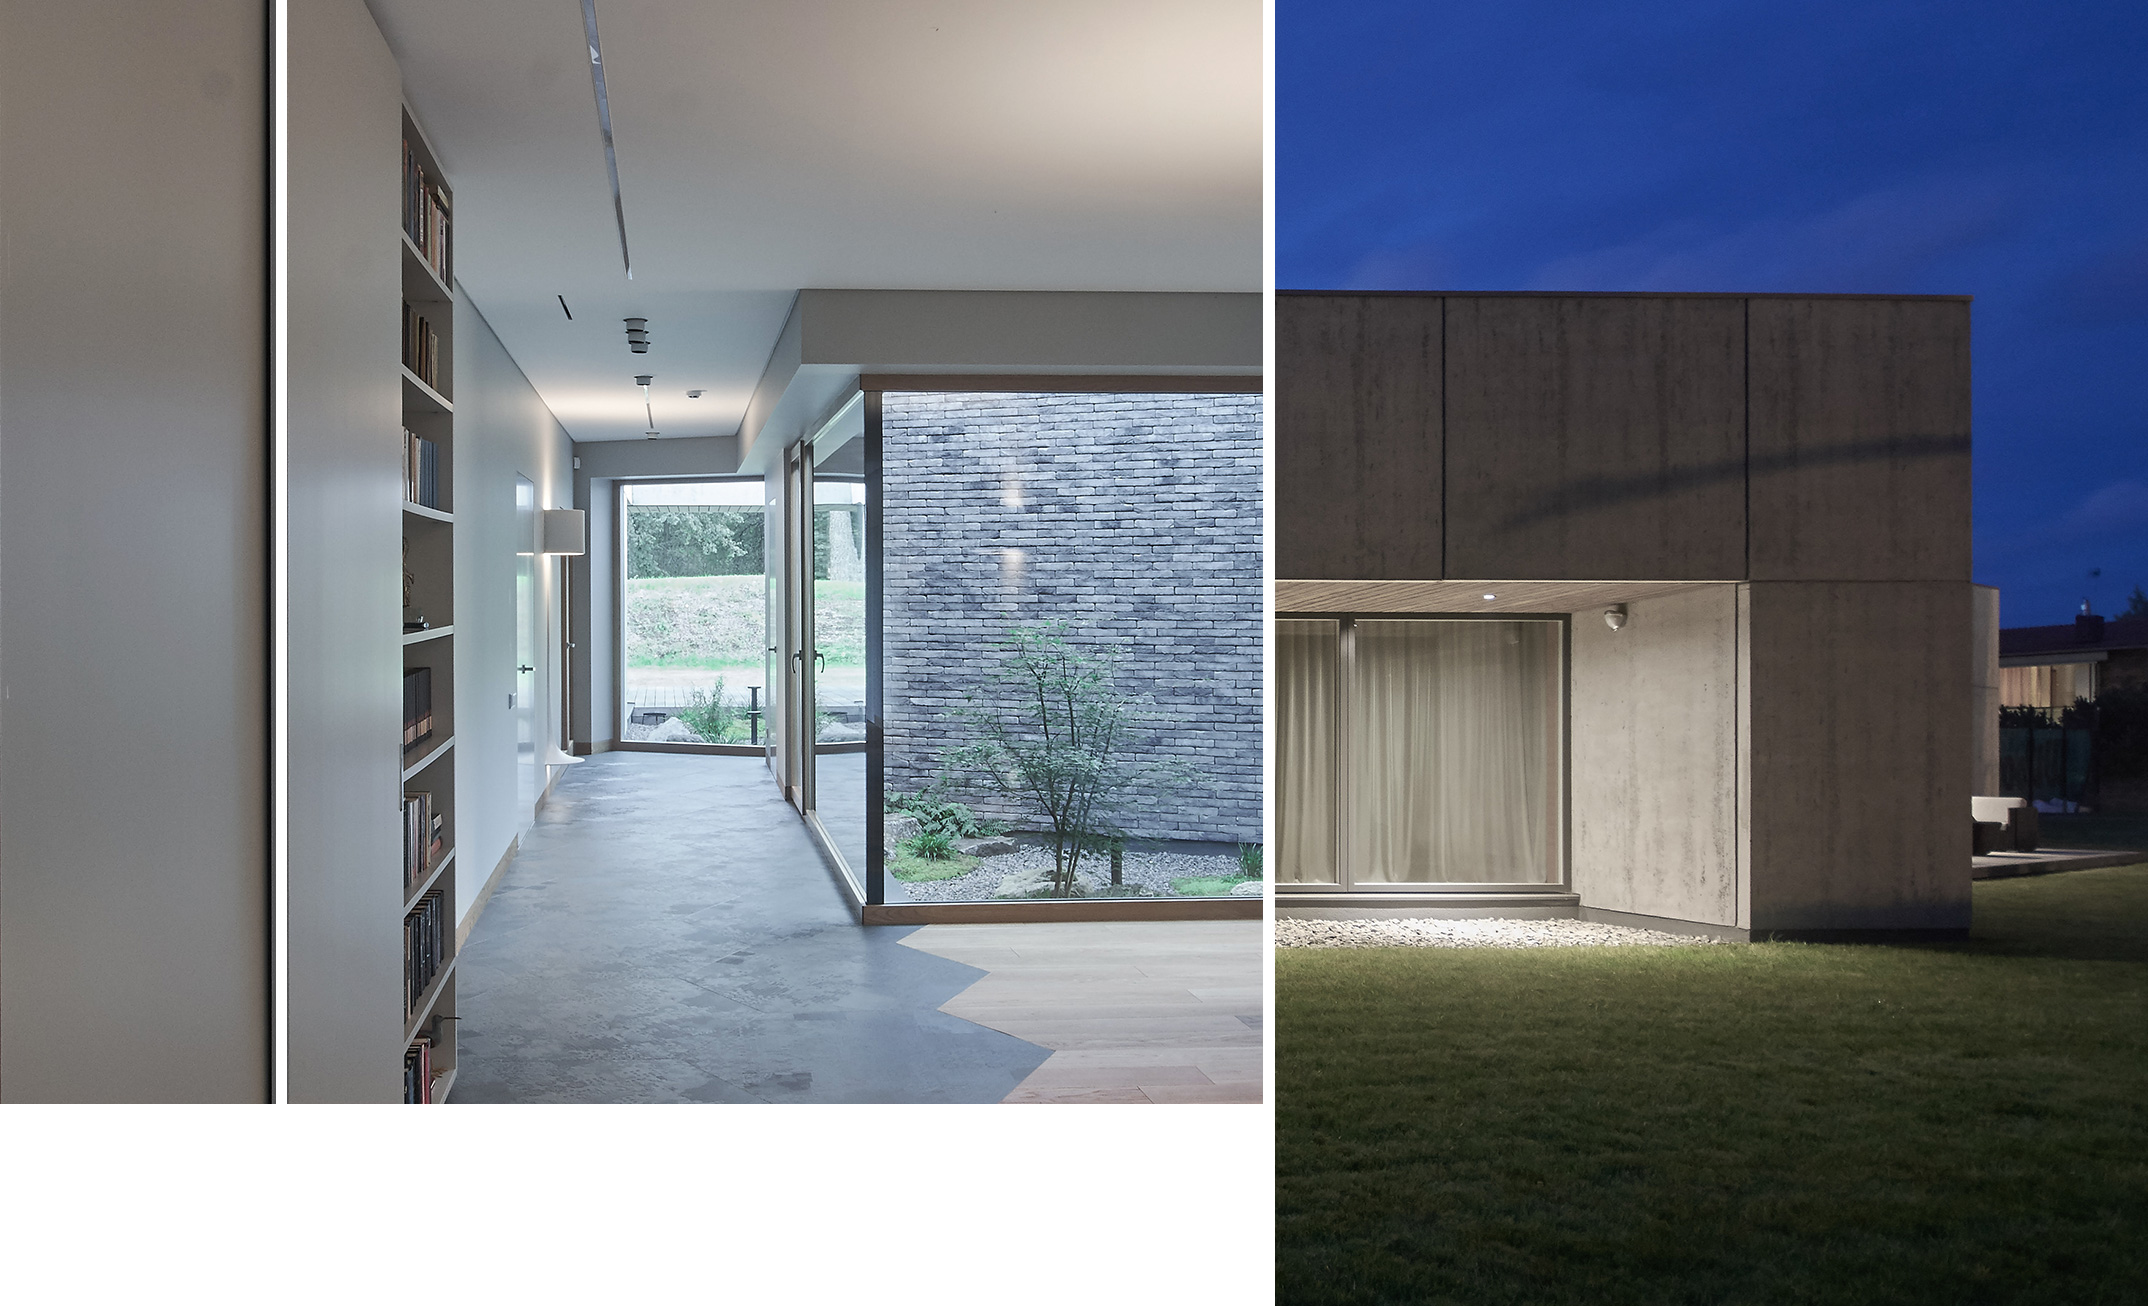 EJtekstile–-interjero-tekstiles-projektavimo-studija--Interior-textile-design-studio-2.1